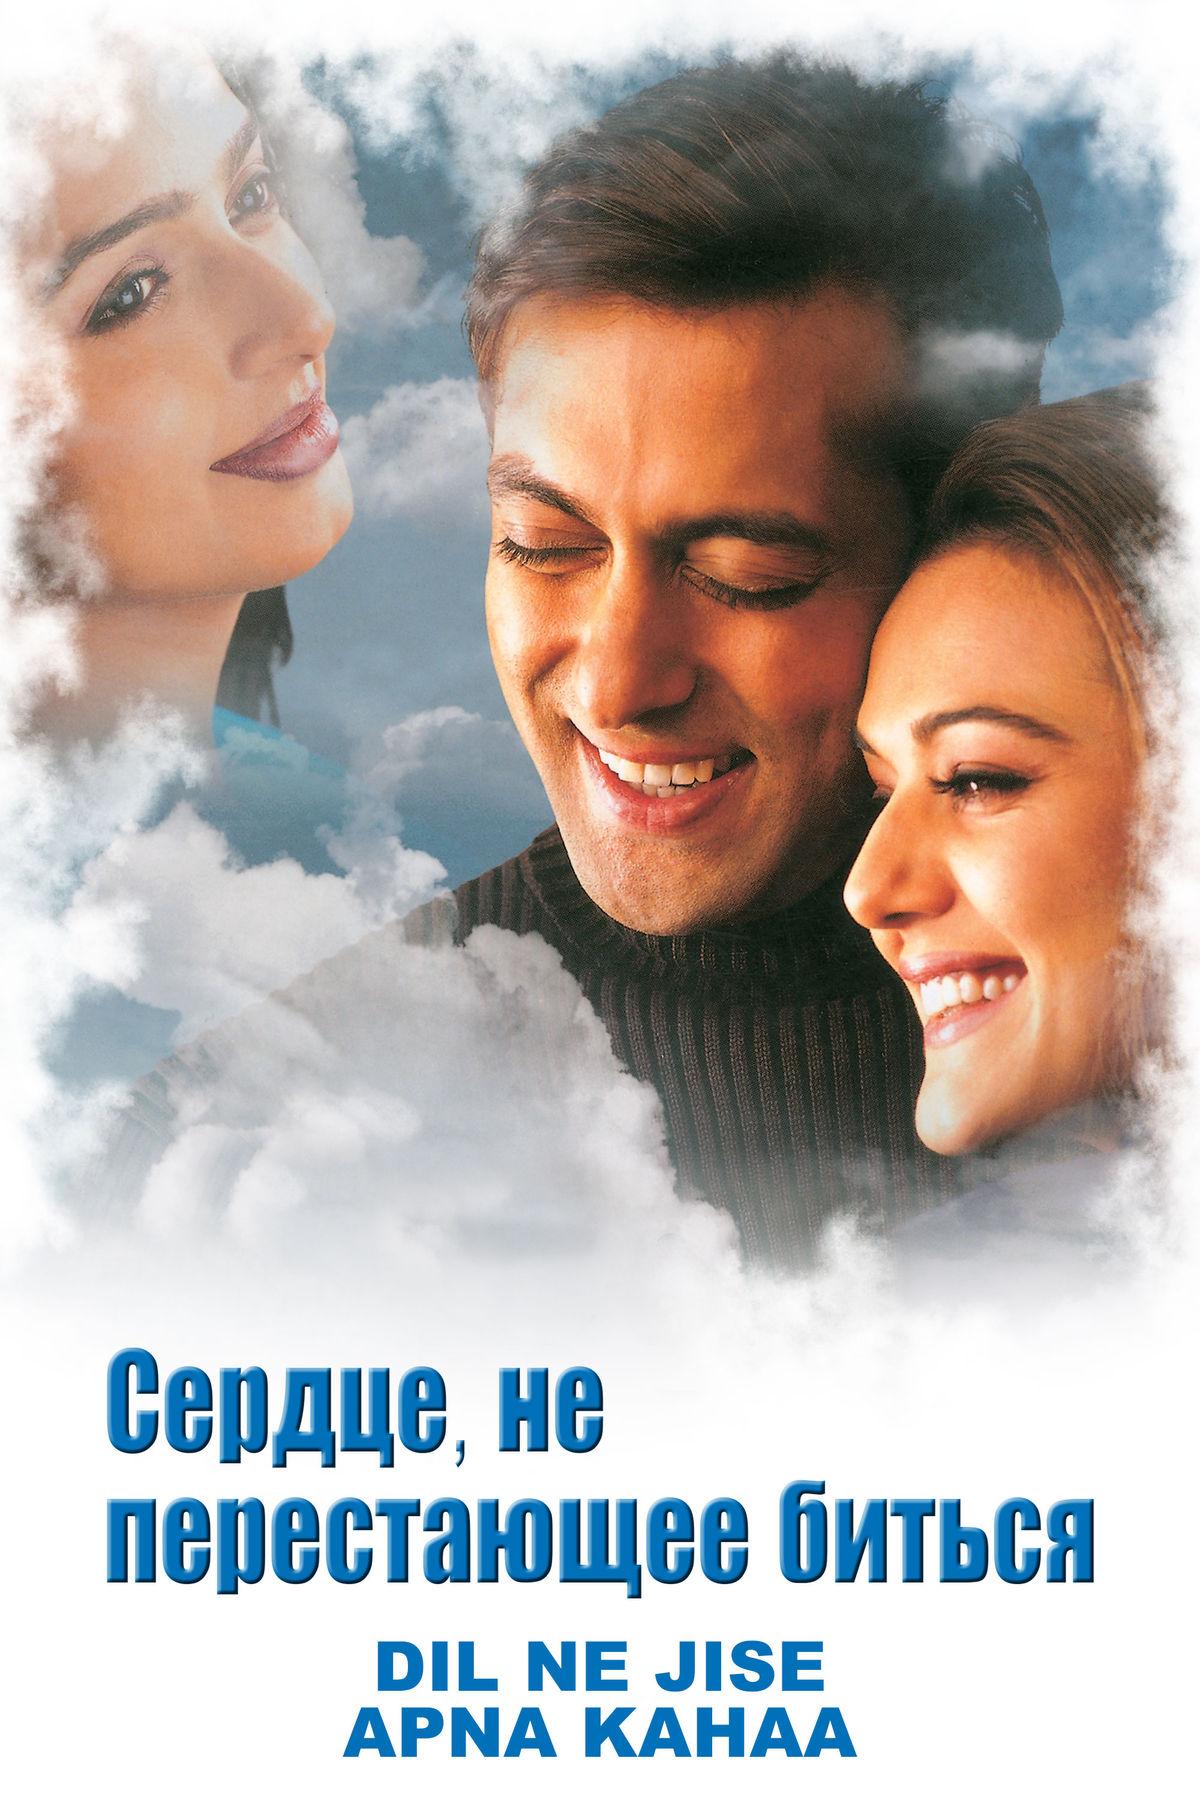 Dil Ne Jise Apna Kahaa - Russian